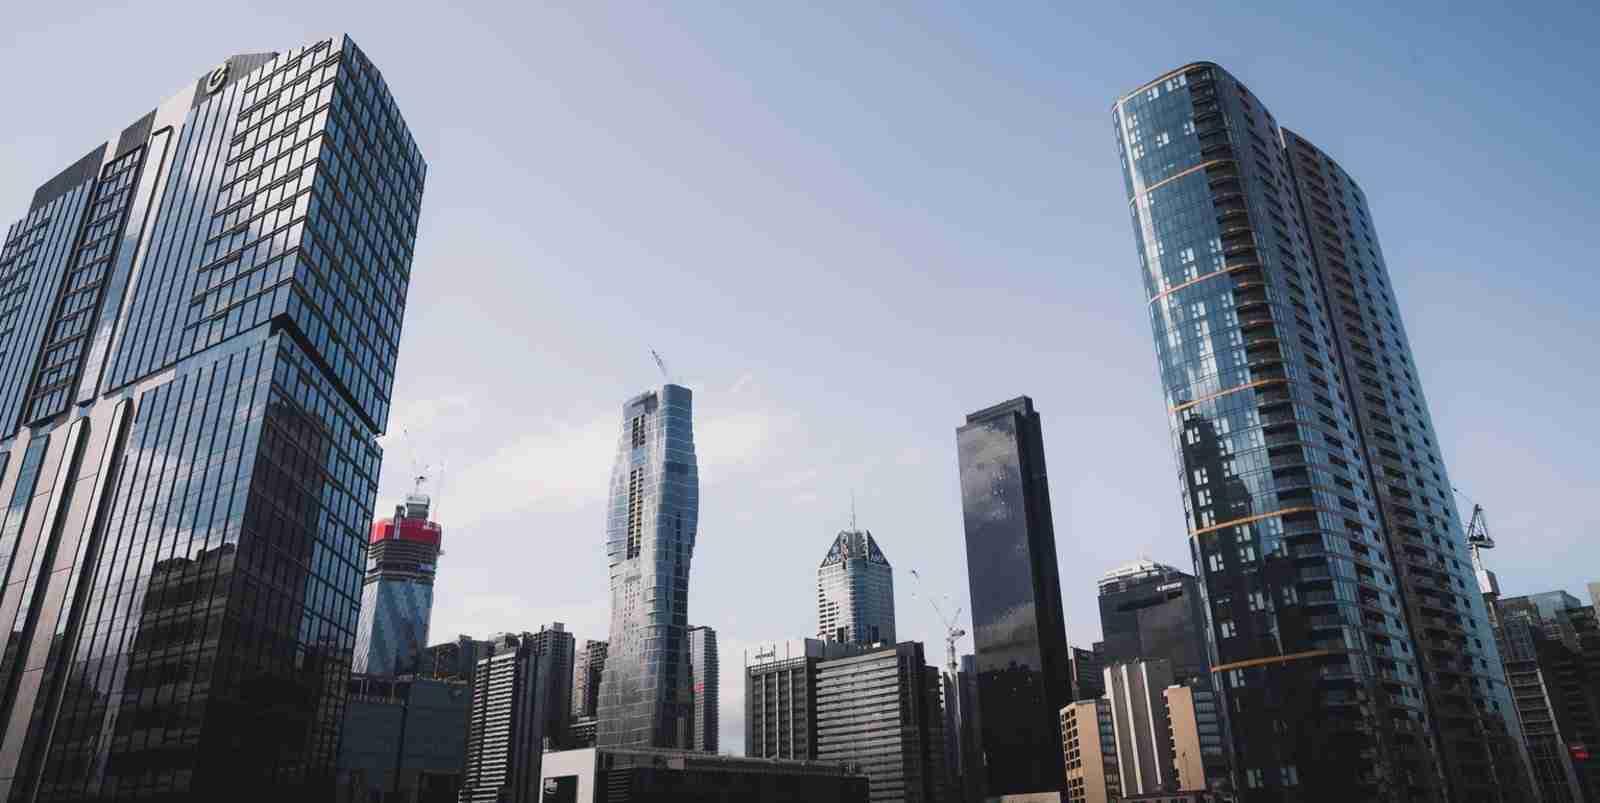 Australian Securities Regulator Discloses Security Breach